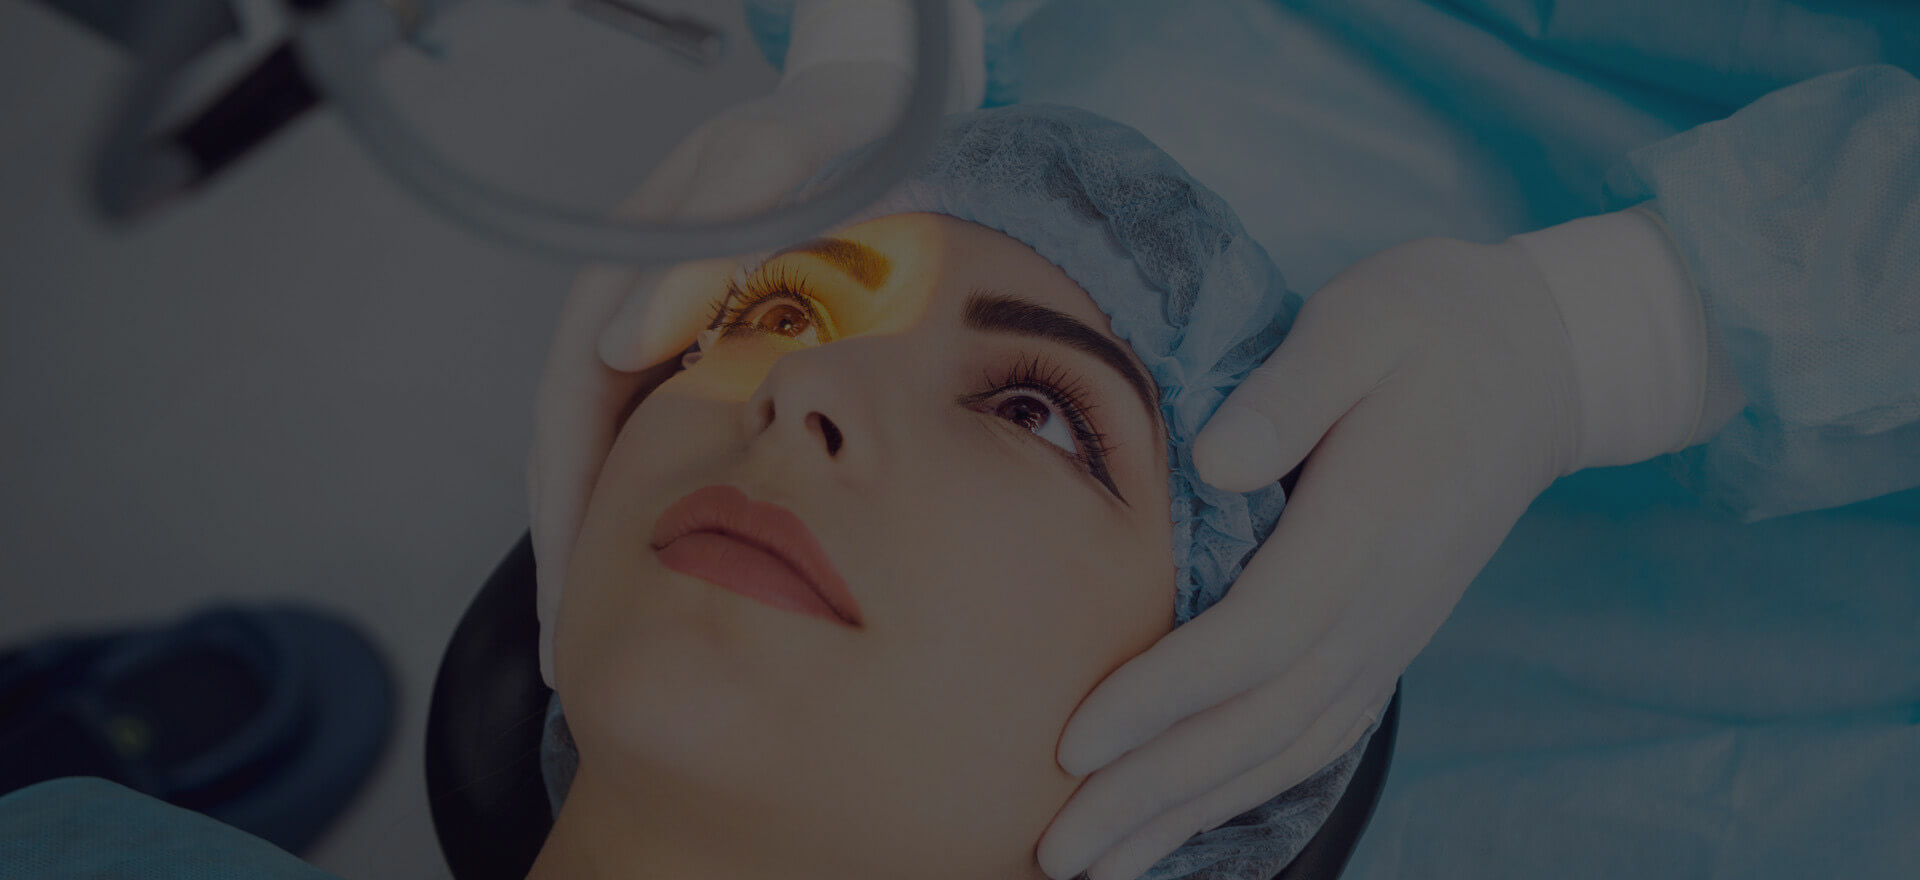 Eye Surgery Clinics